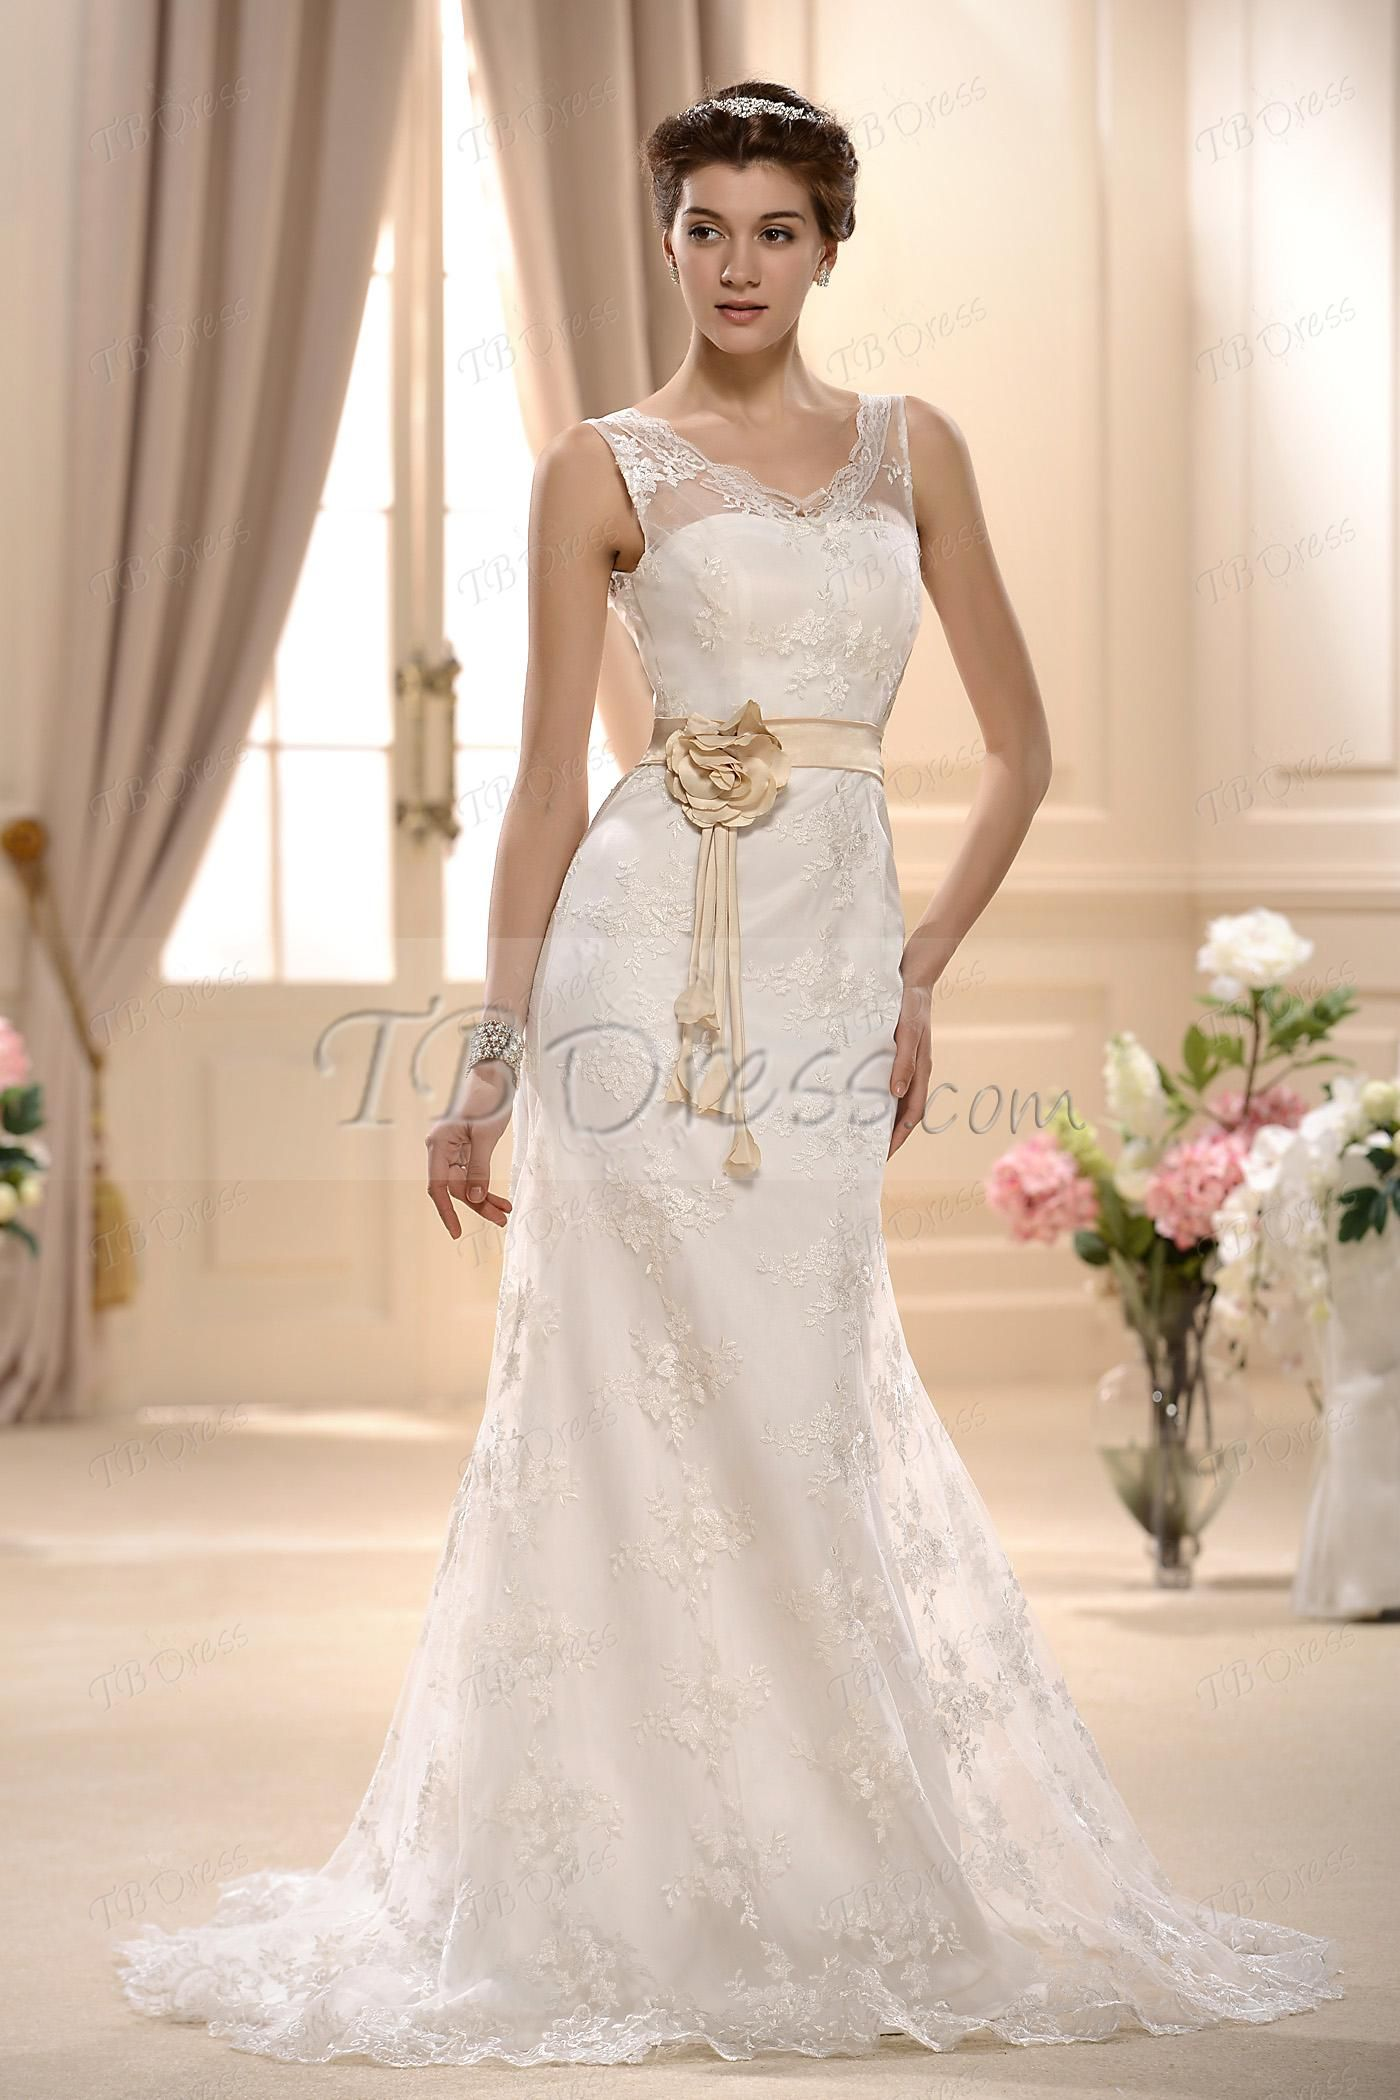 Elegant sheathcolumn sleeveless vneck lace vintage wedding dress